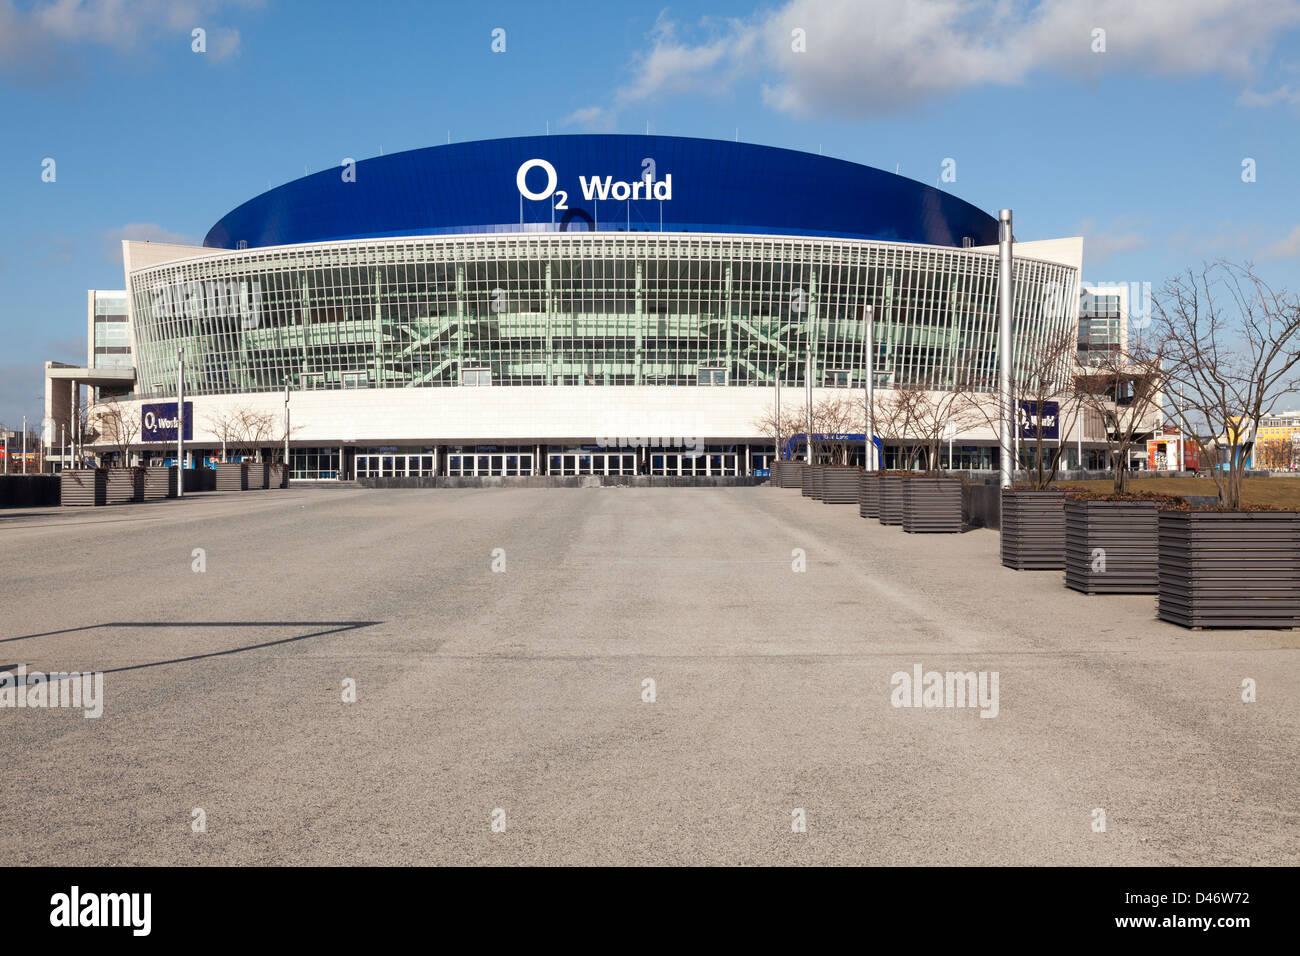 O2 World Arena, Berlin, Germany - Stock Image